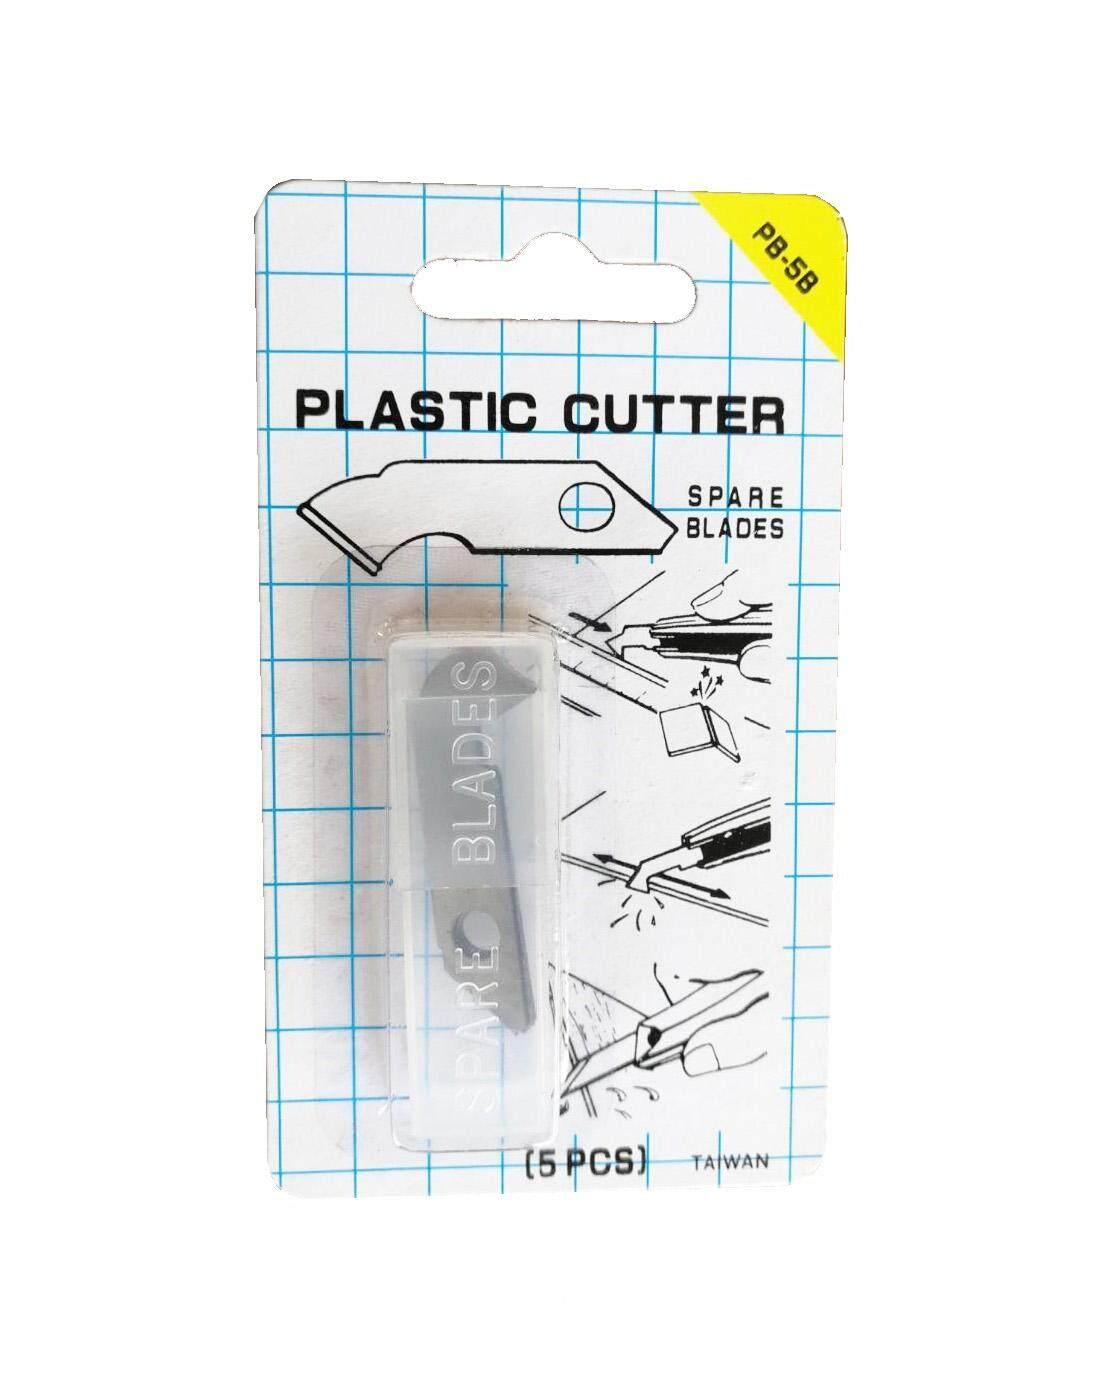 5pcs Plastic Cutter Blades